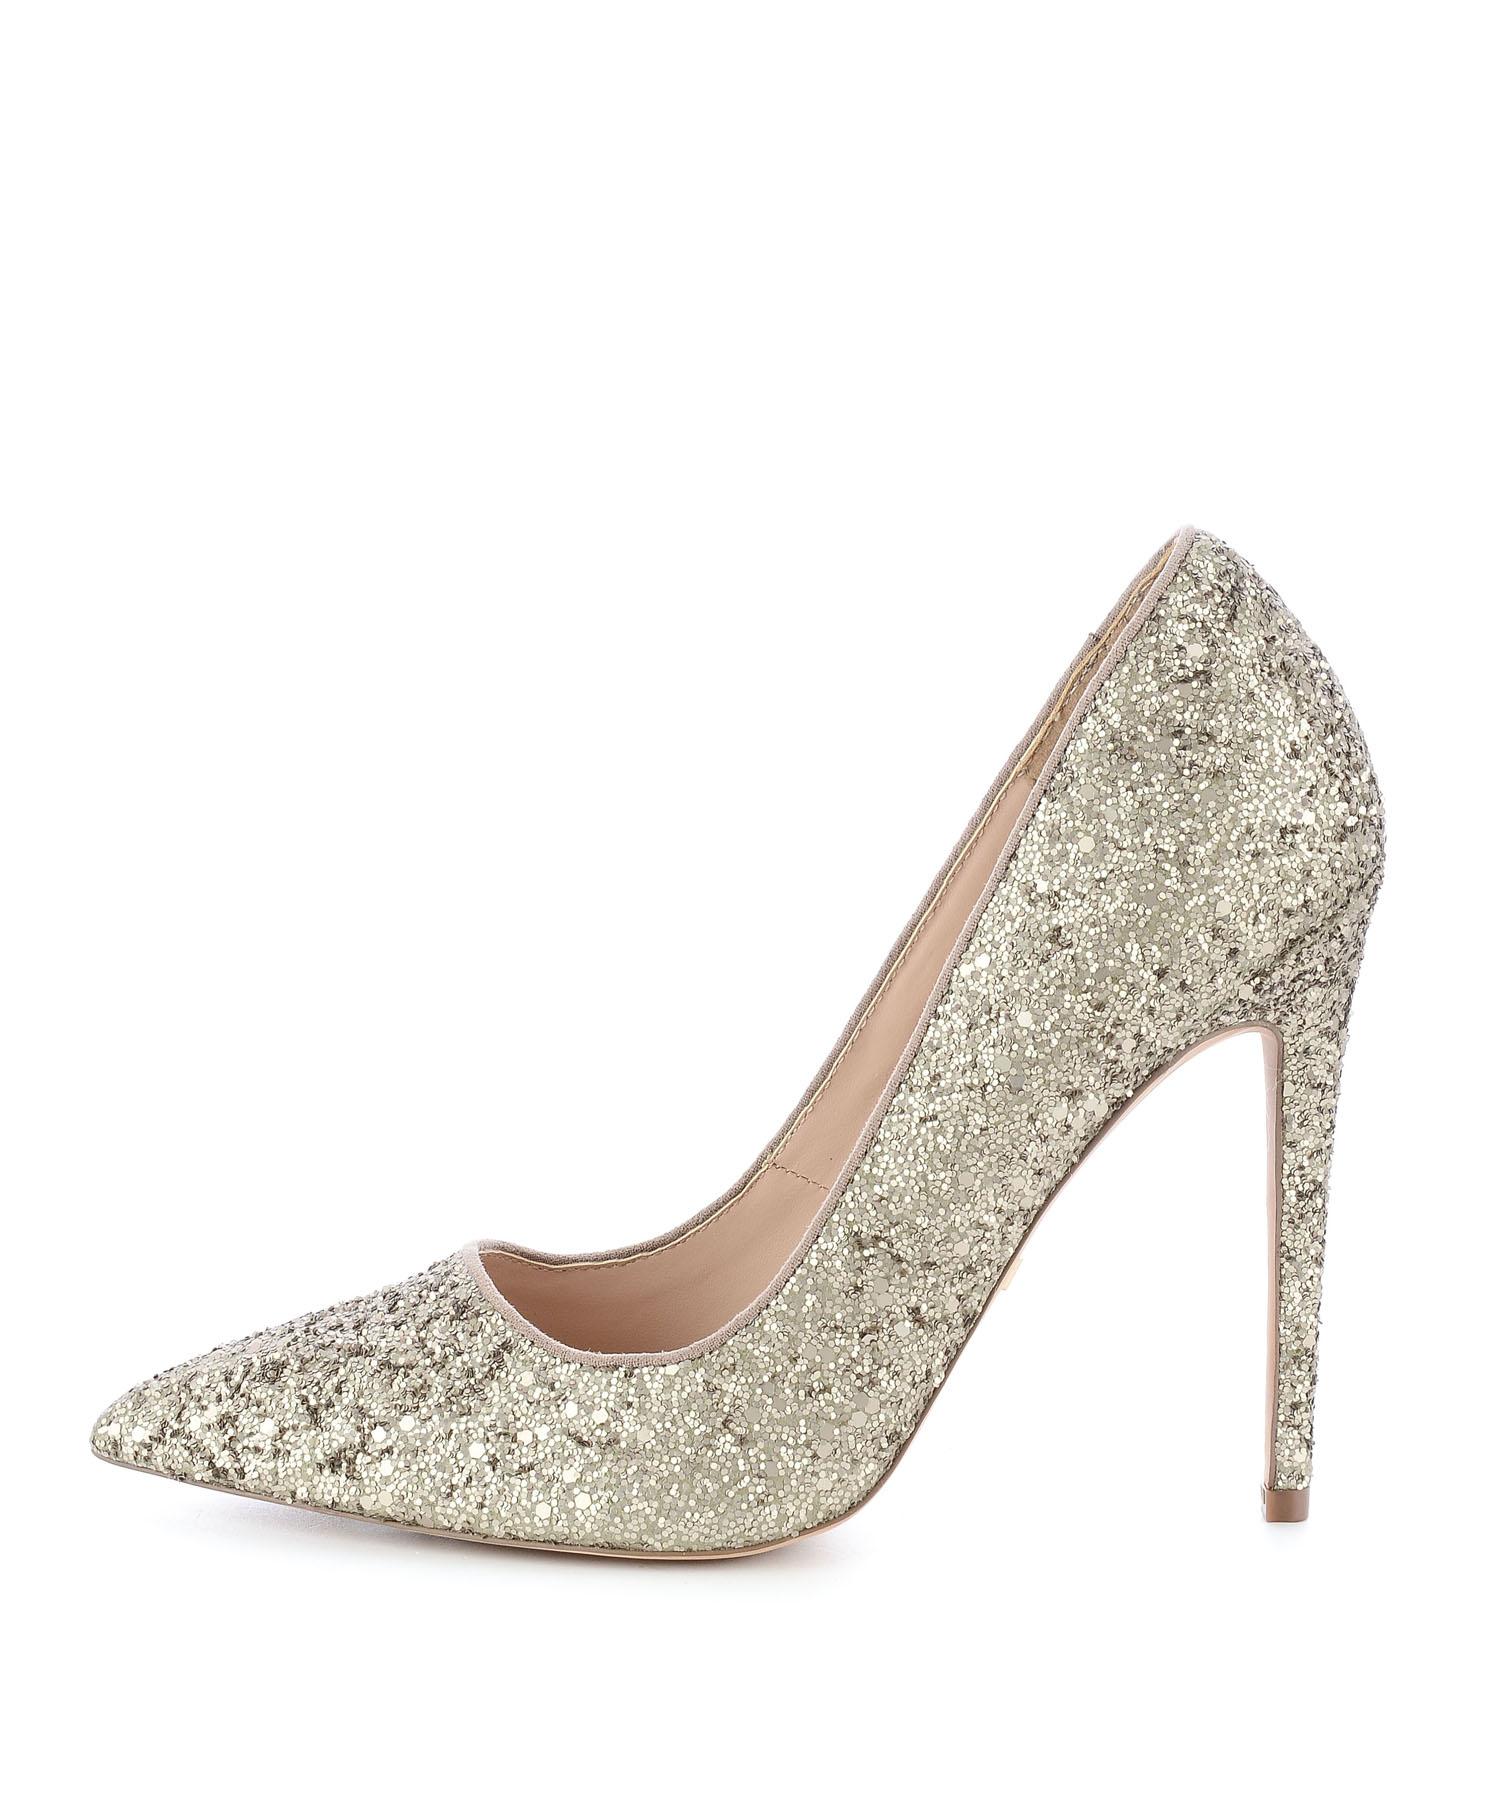 złote brokatowe szpilki Prima Moda